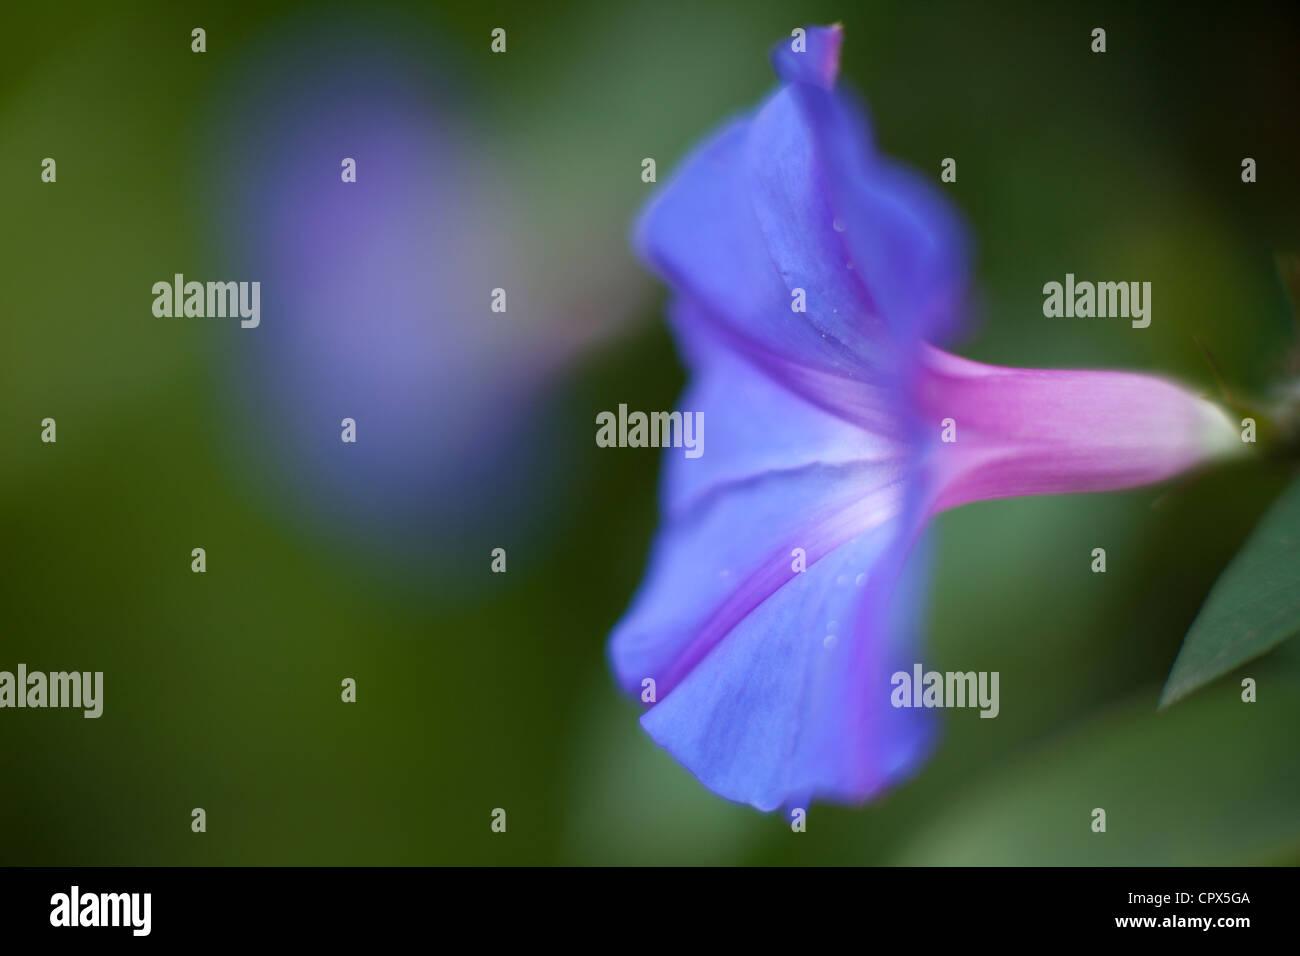 morning glory, Sri Lanka - Stock Image